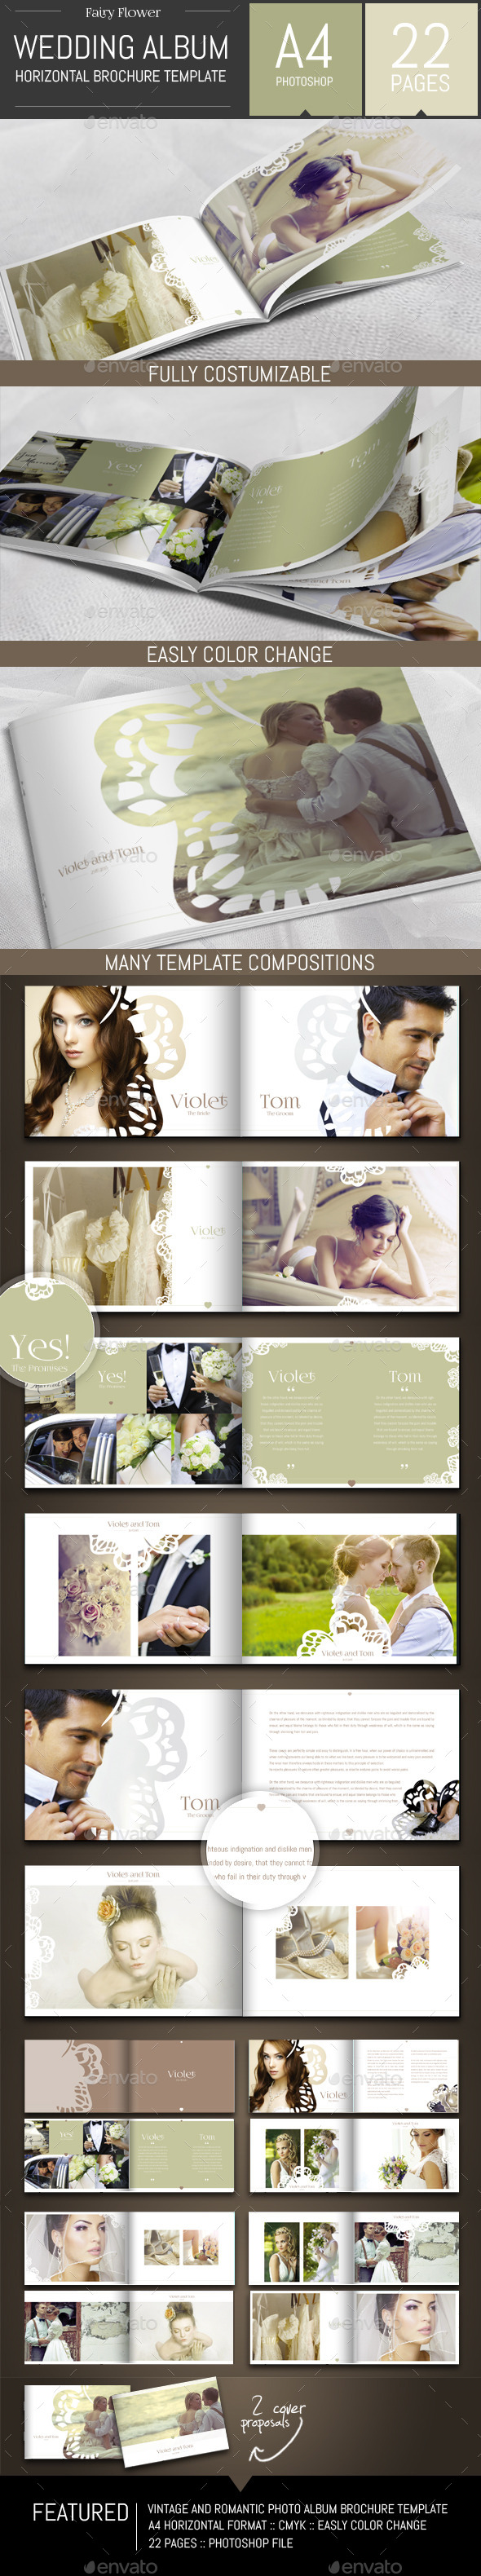 Wedding Photo Album Horizontal Brochure Template - Photo Albums Print Templates